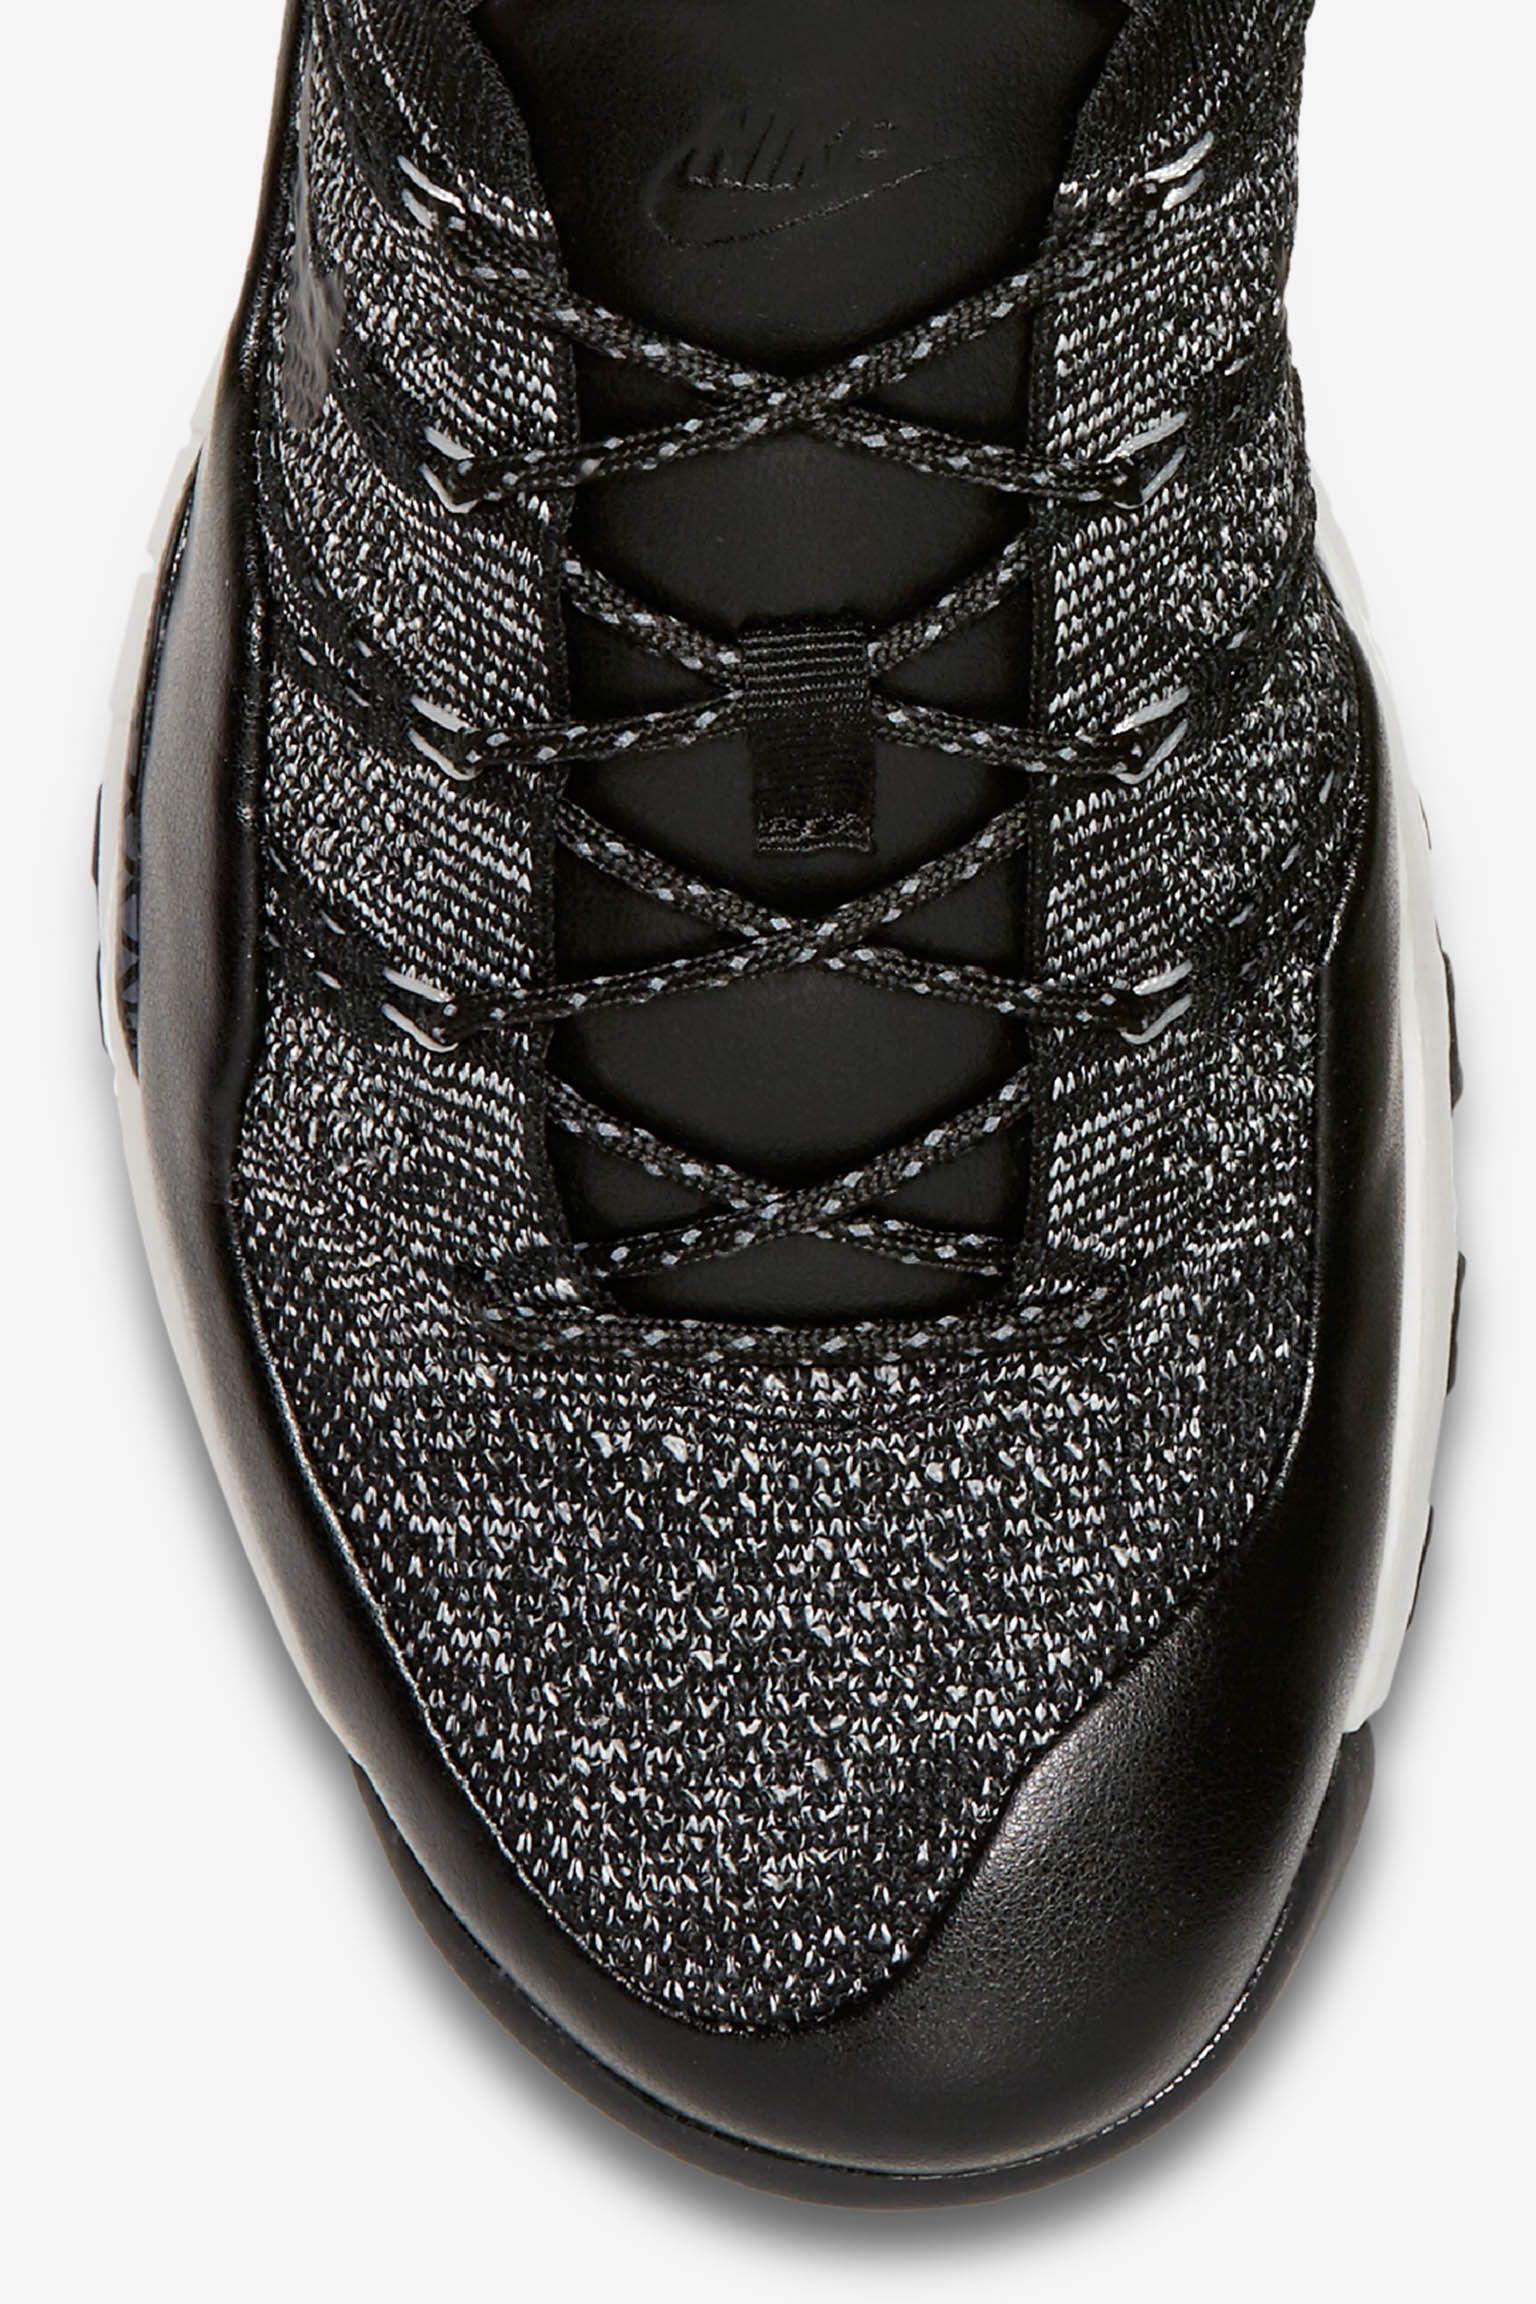 Nike Lupinek Flyknit Low 'Black & Anthracite'